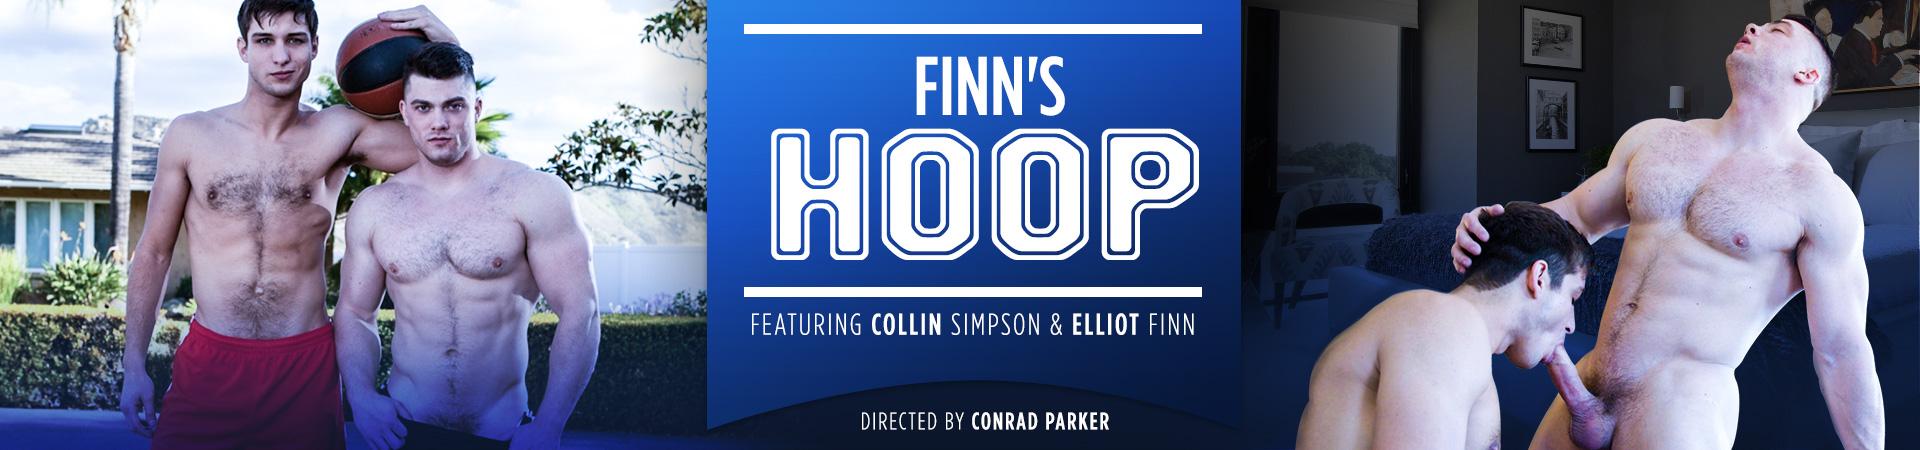 Finn's Hoop Featuring Collin Simpson and Elliot Finn